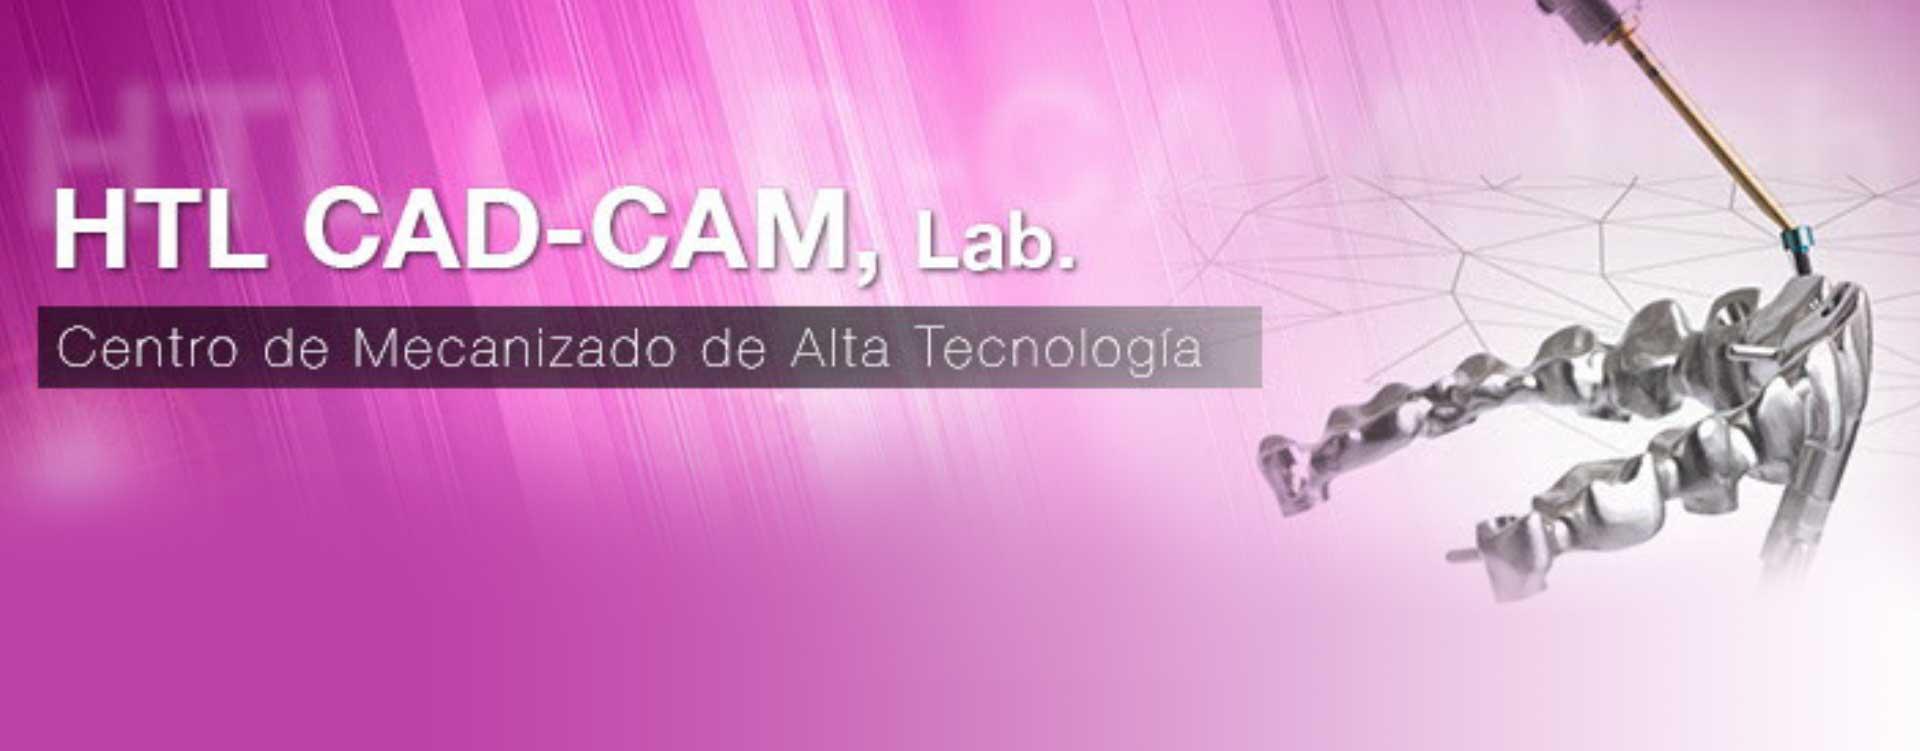 clinica-gorosabel-dental-tecnologia-cad-cam